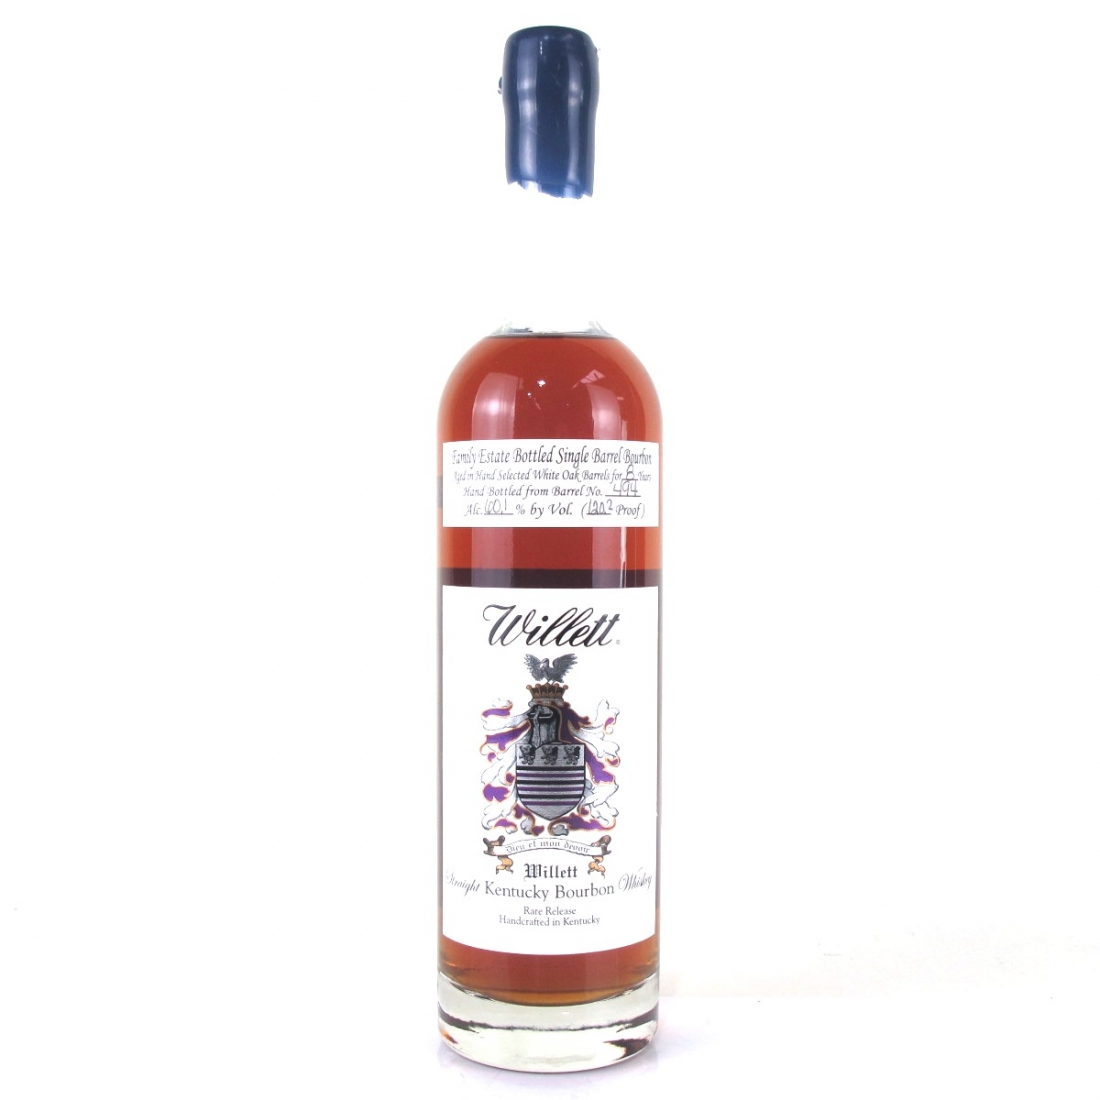 Willett Family Estate 8 Year Old Single Barrel Bourbon #494 / Binnys Beverage Depot